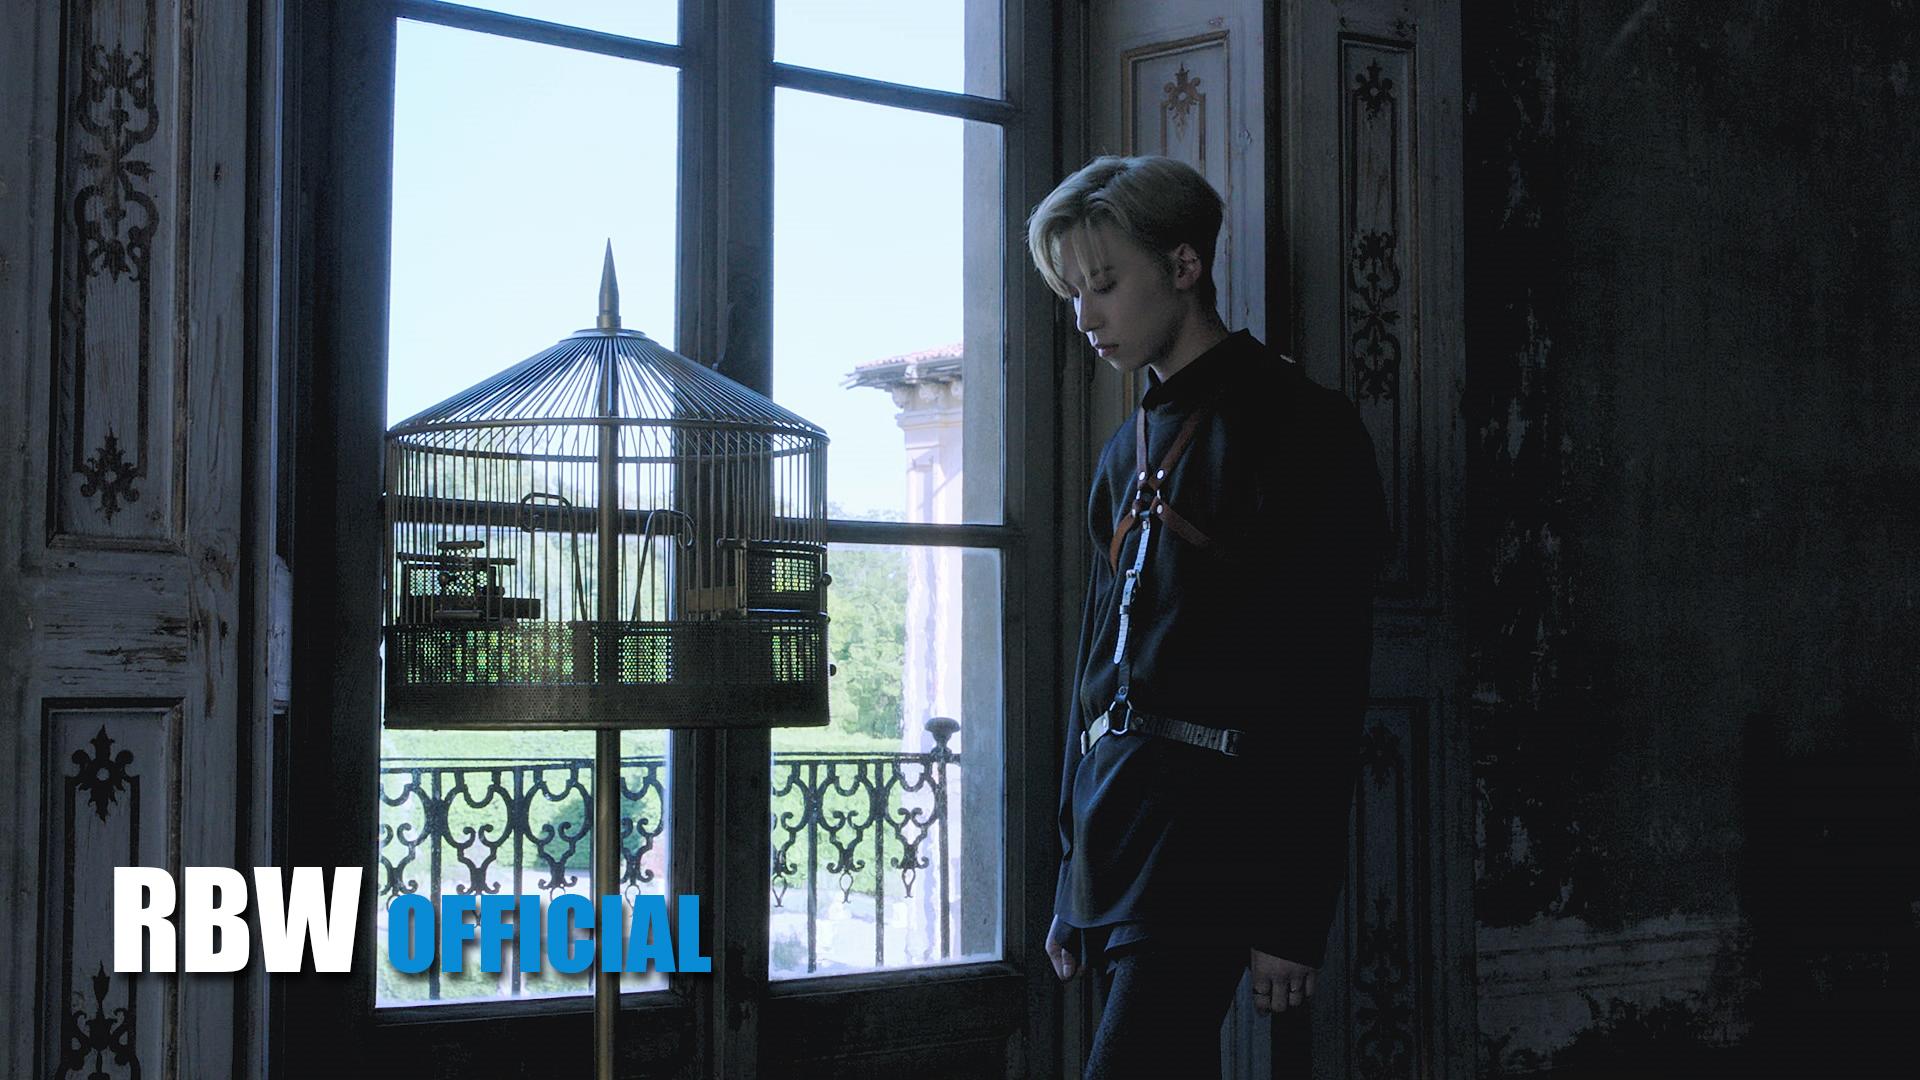 ONEUS(원어스) 태양이 떨어진다(Twilight) Concept Film - 건희(KEONHEE)